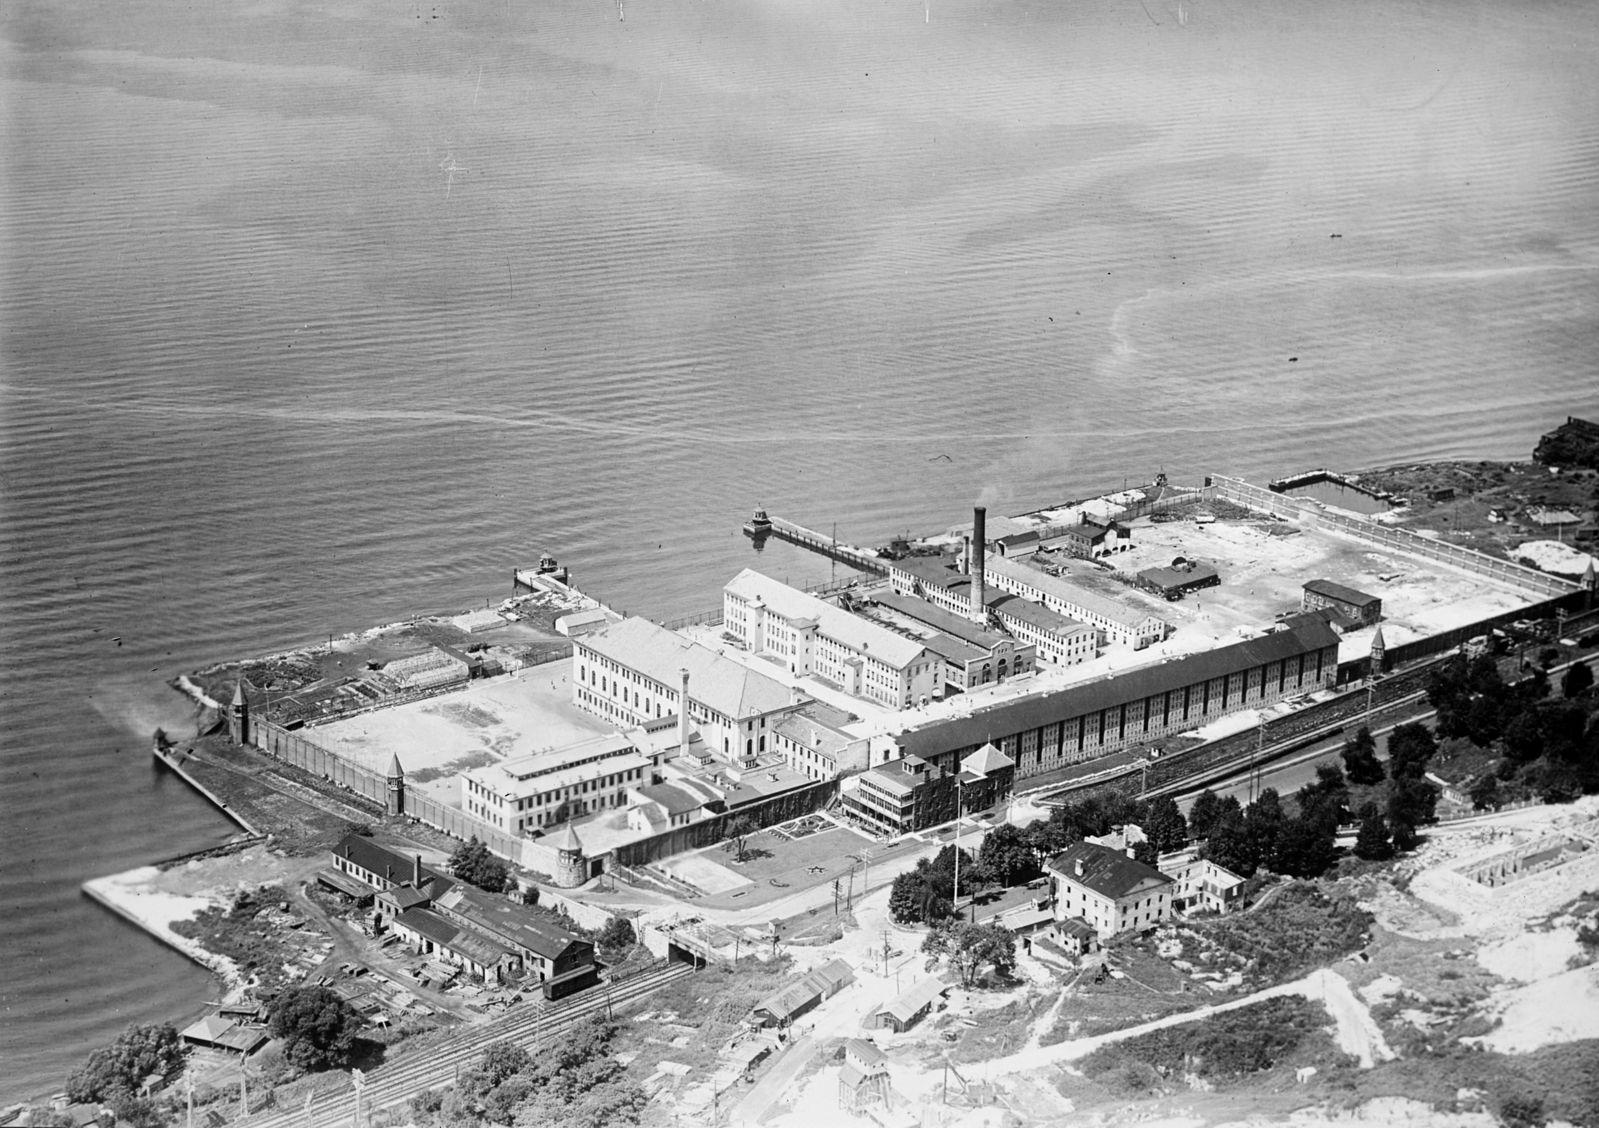 Sing_Sing_prison_aerial_photo_1920.jpg